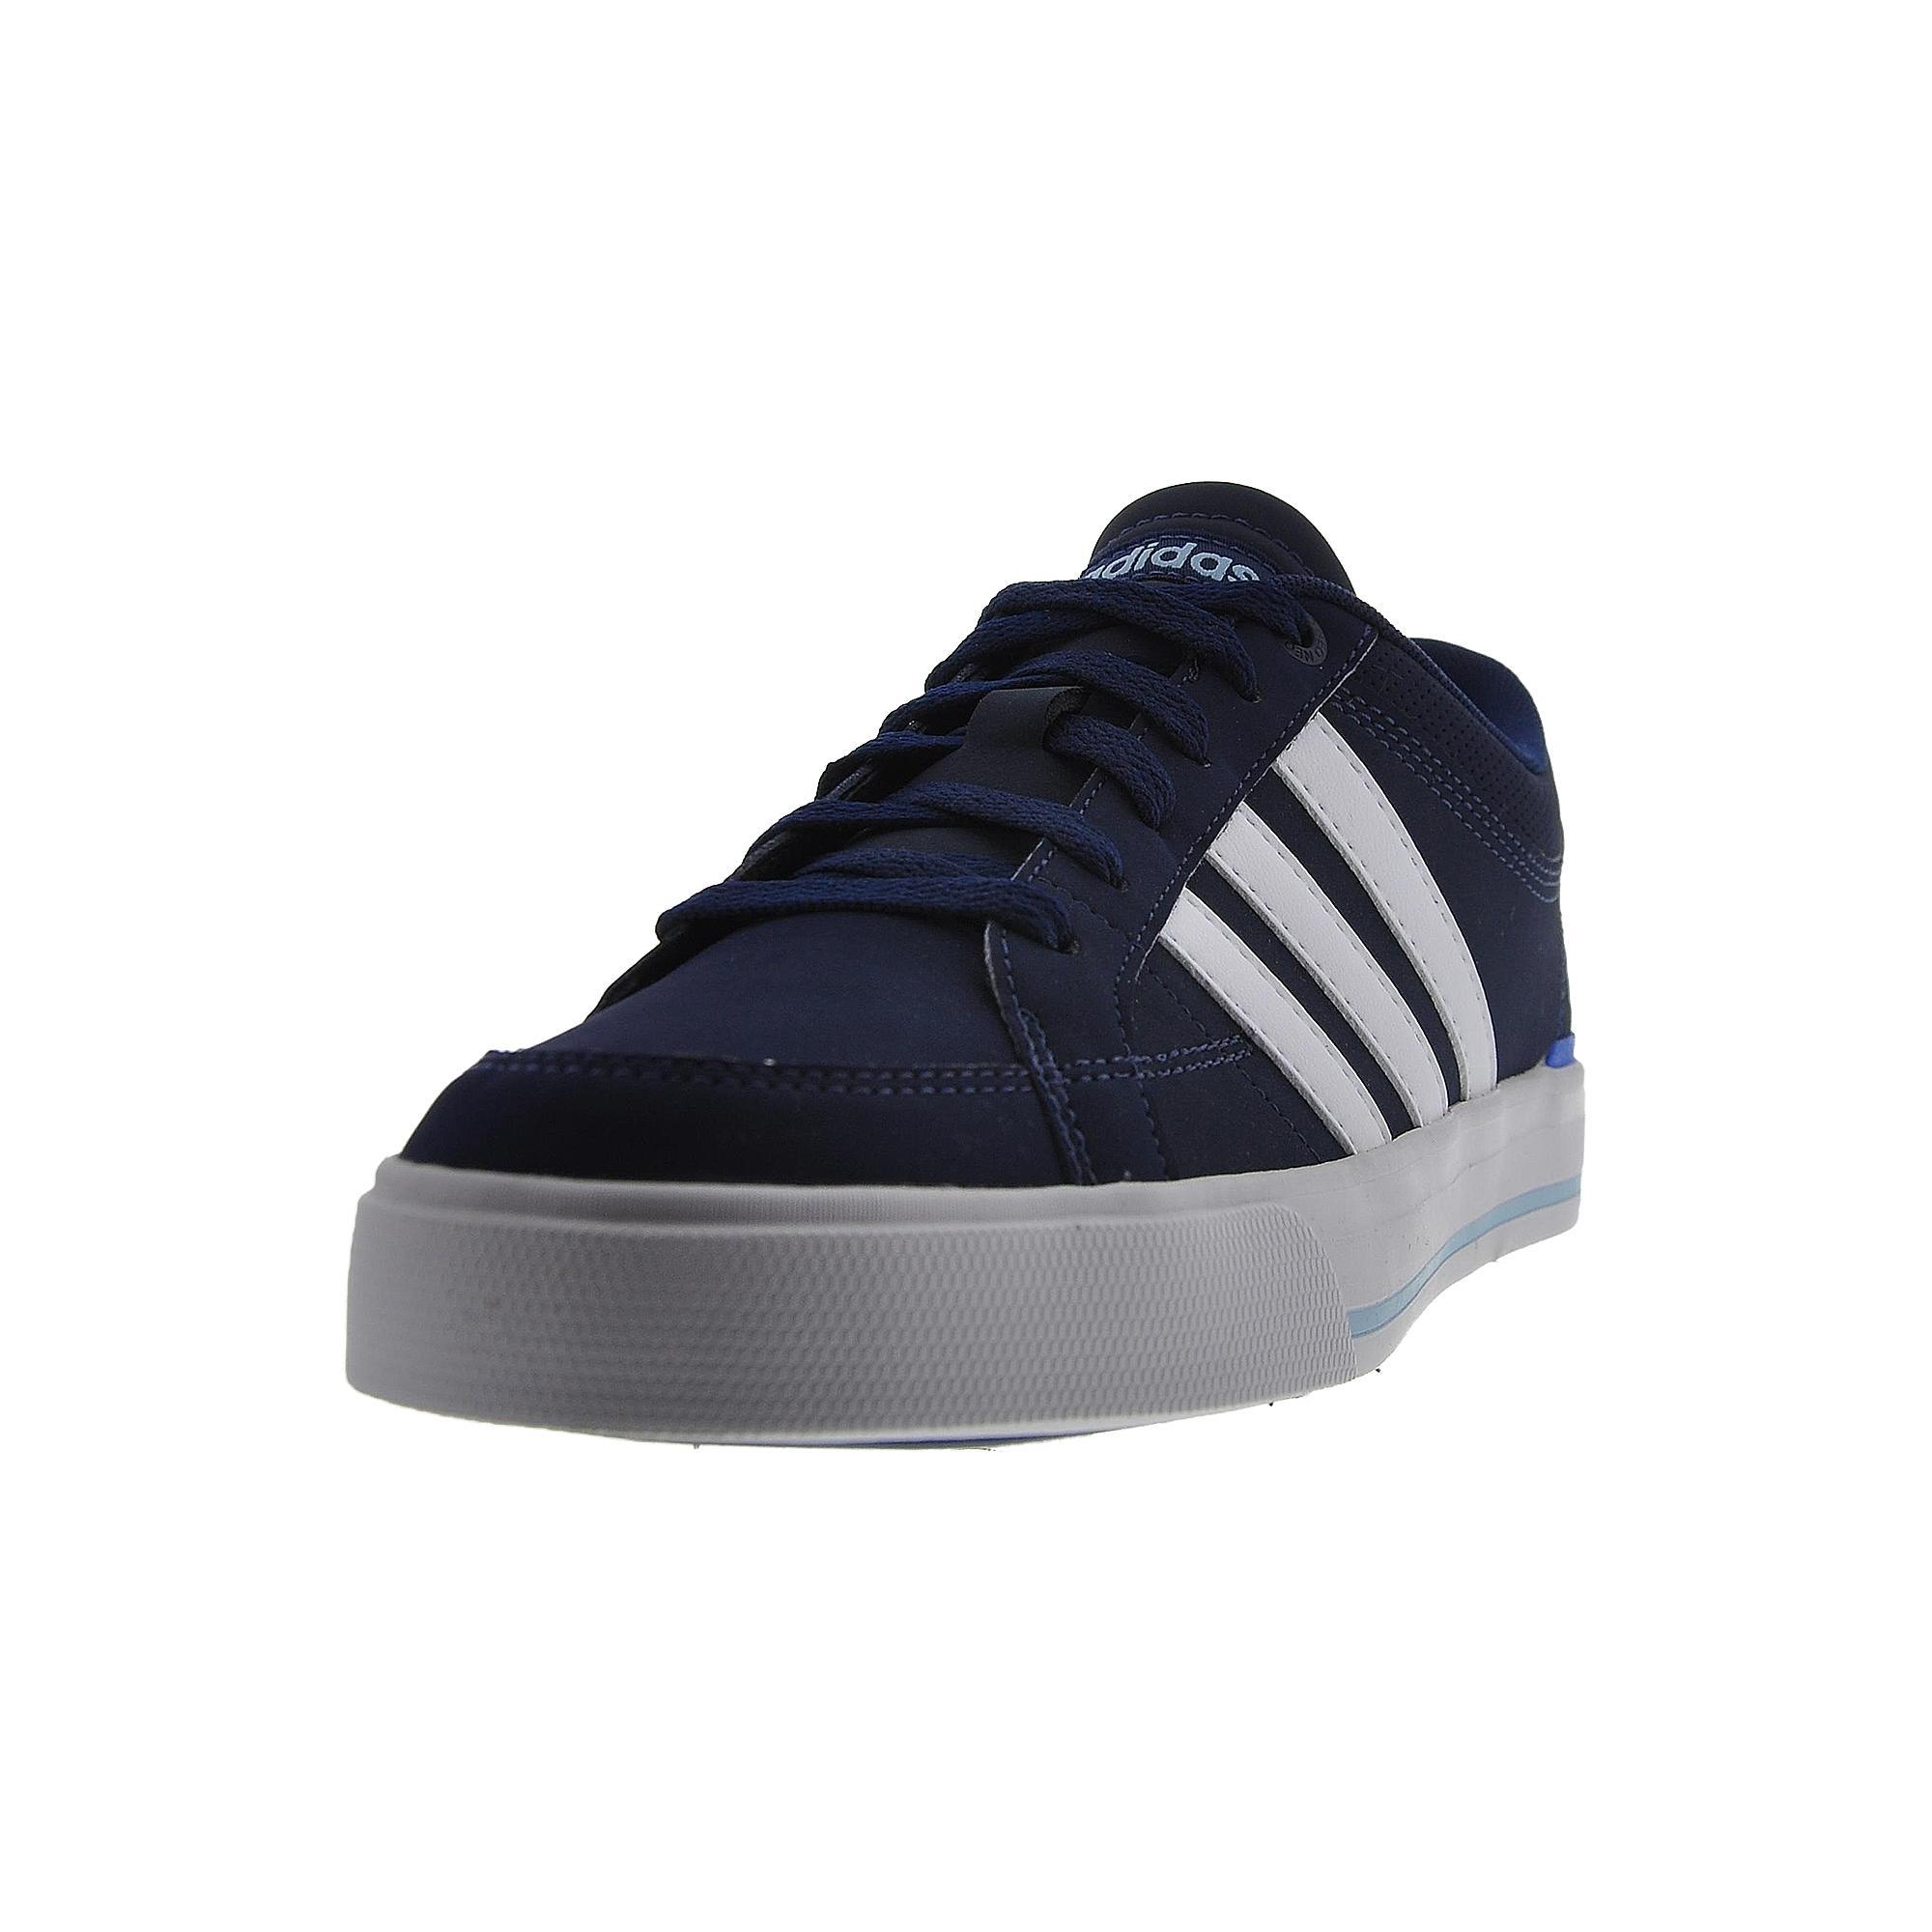 Adidas Ayakkabı Skool F99512